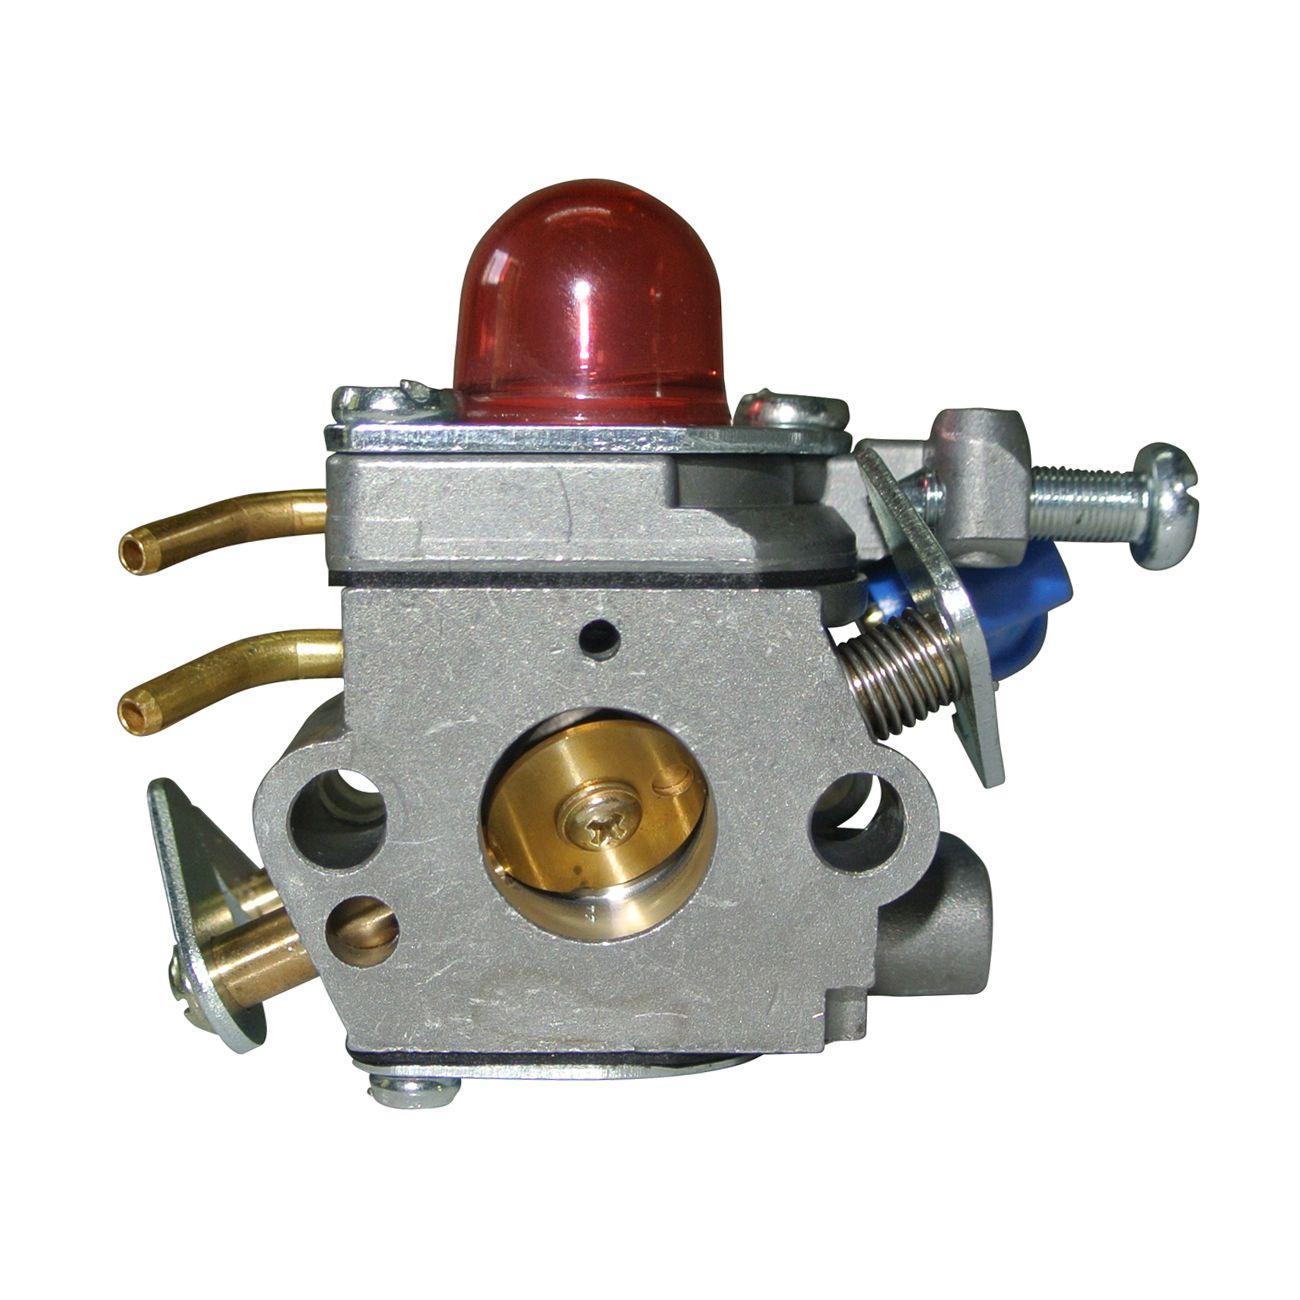 NEW Carburetor For Husqvarna 124L 124C 125C 125E 125L 125LD 128CD 128LDX 128DJX